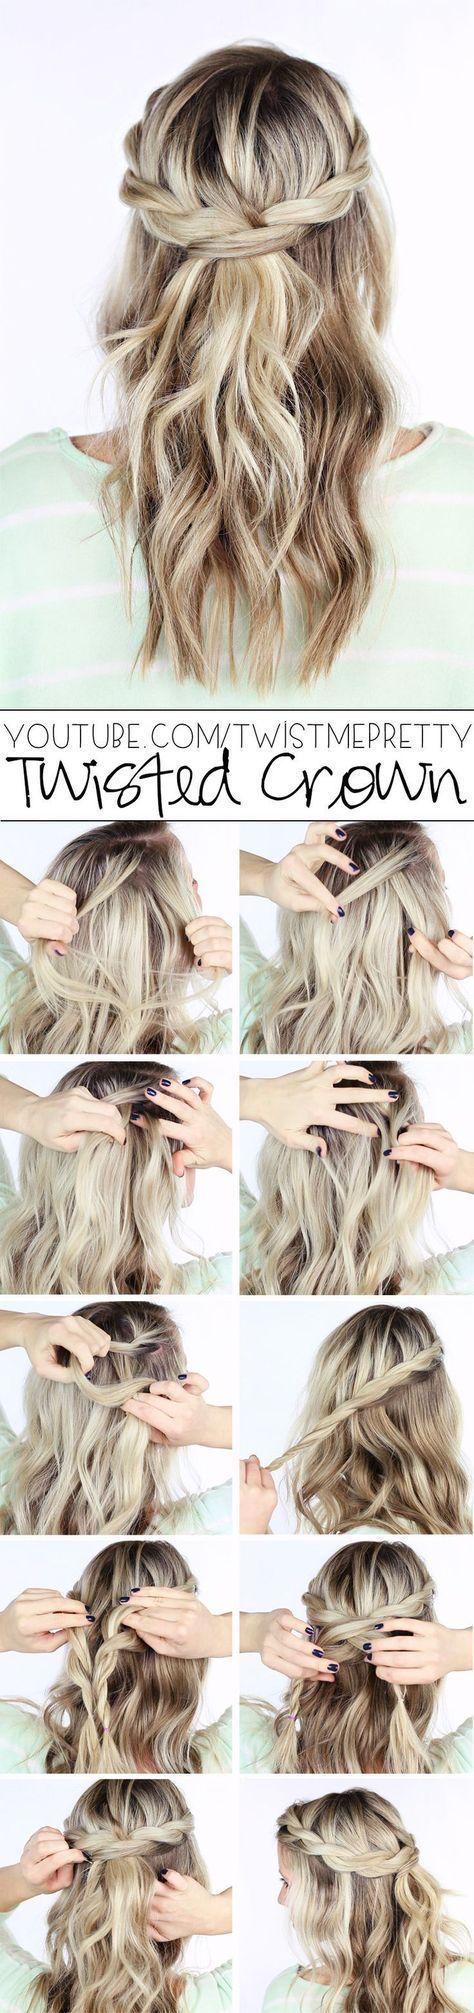 twisted crown braid half up half down hairstyle. by twistmepretty.com